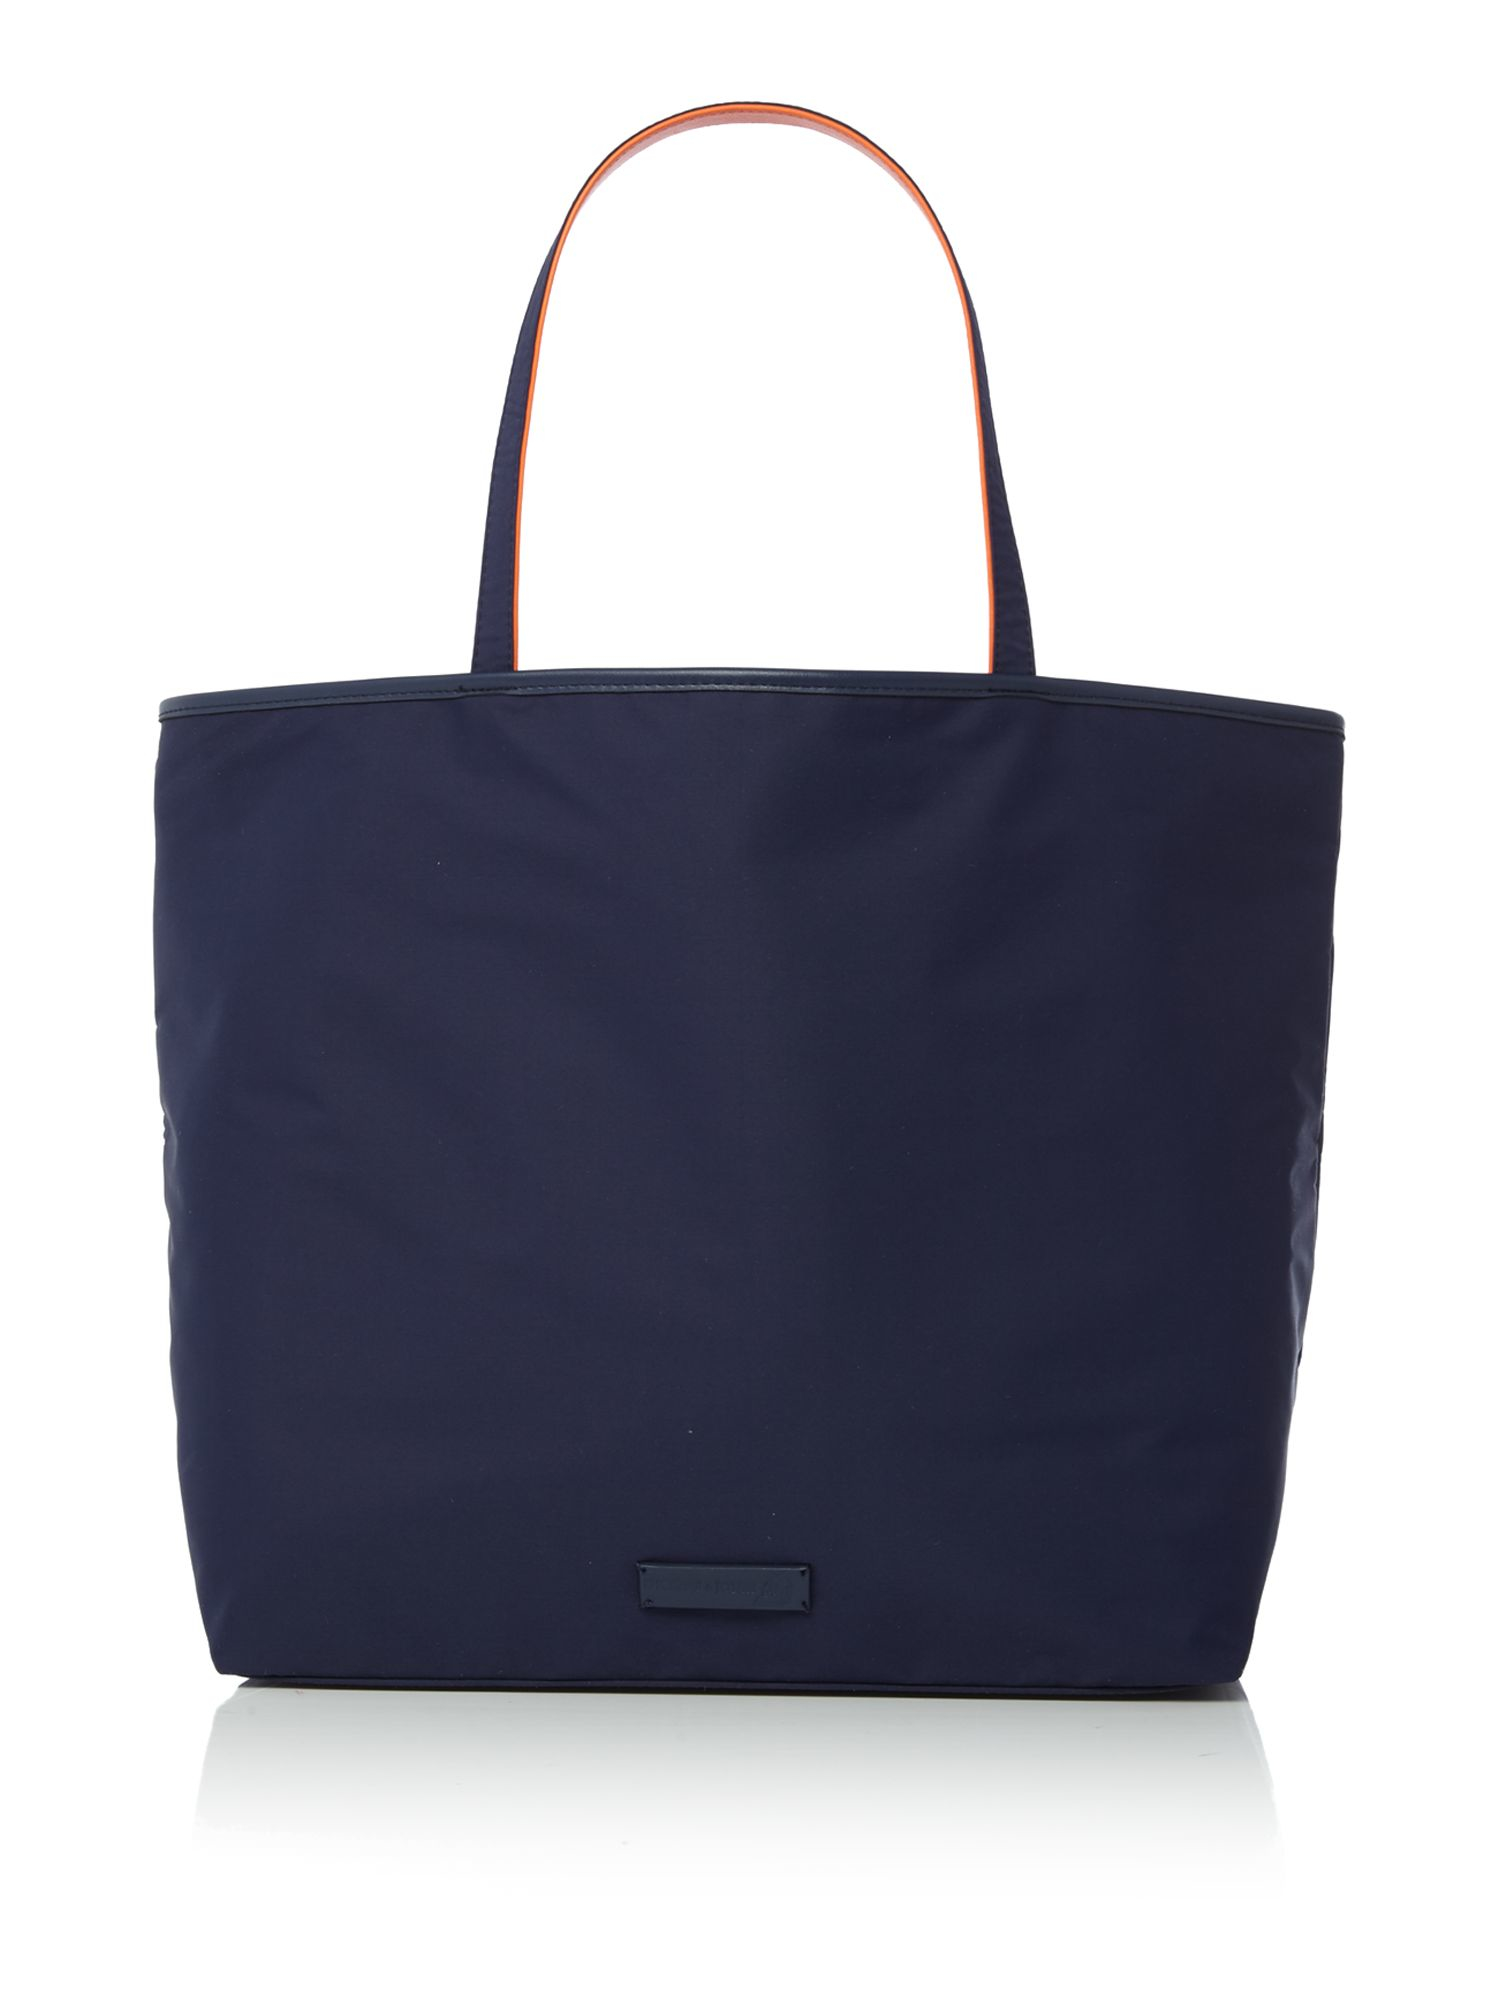 Dickins & Jones Large Zip Top Nylon Tote Bag in Navy (Blue)